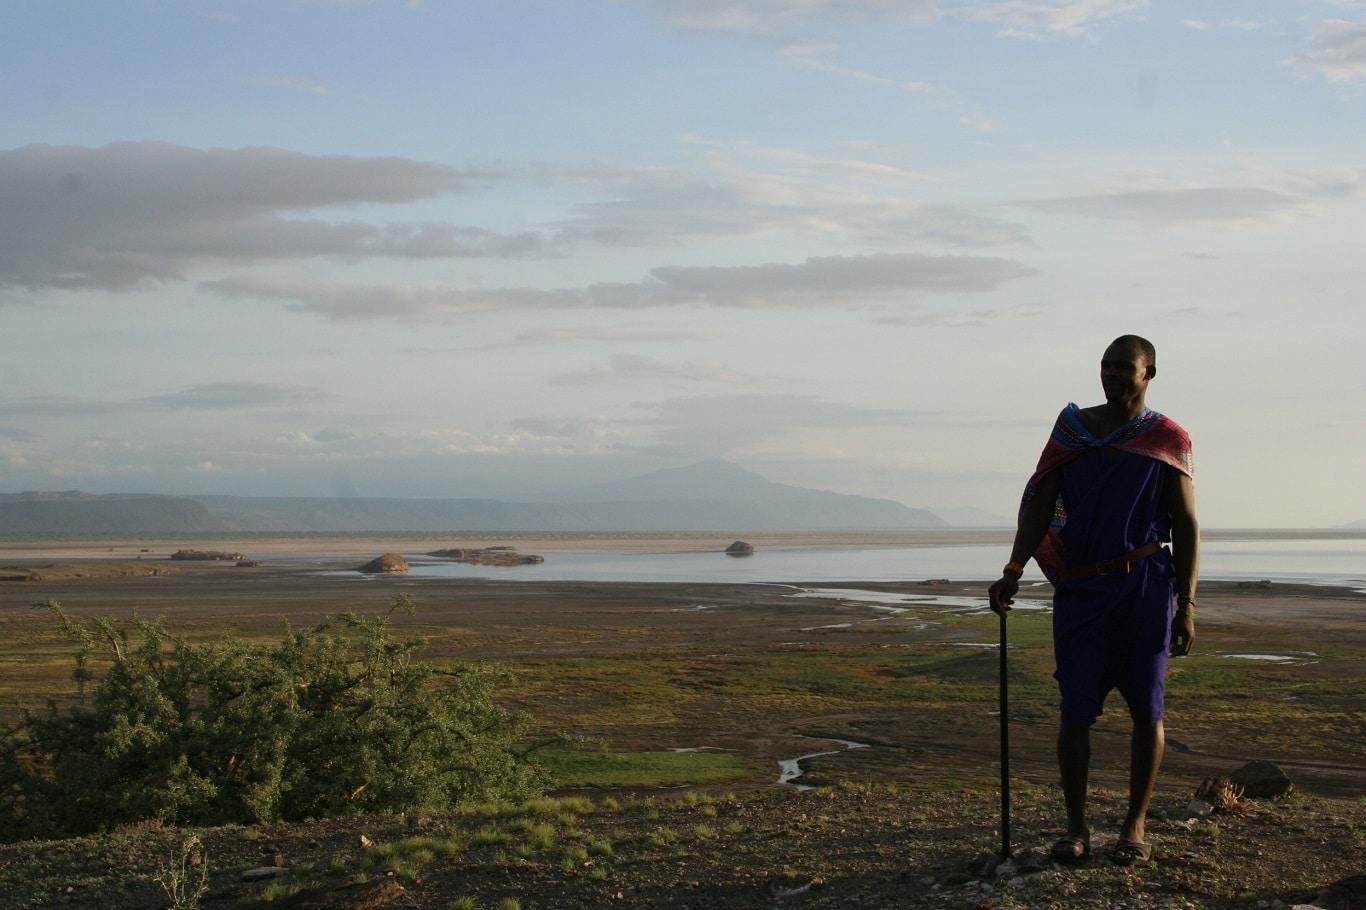 Actie & Avontuur reizen Afrika - Wandeling met Maasai gids Lake Natron, Tanzania